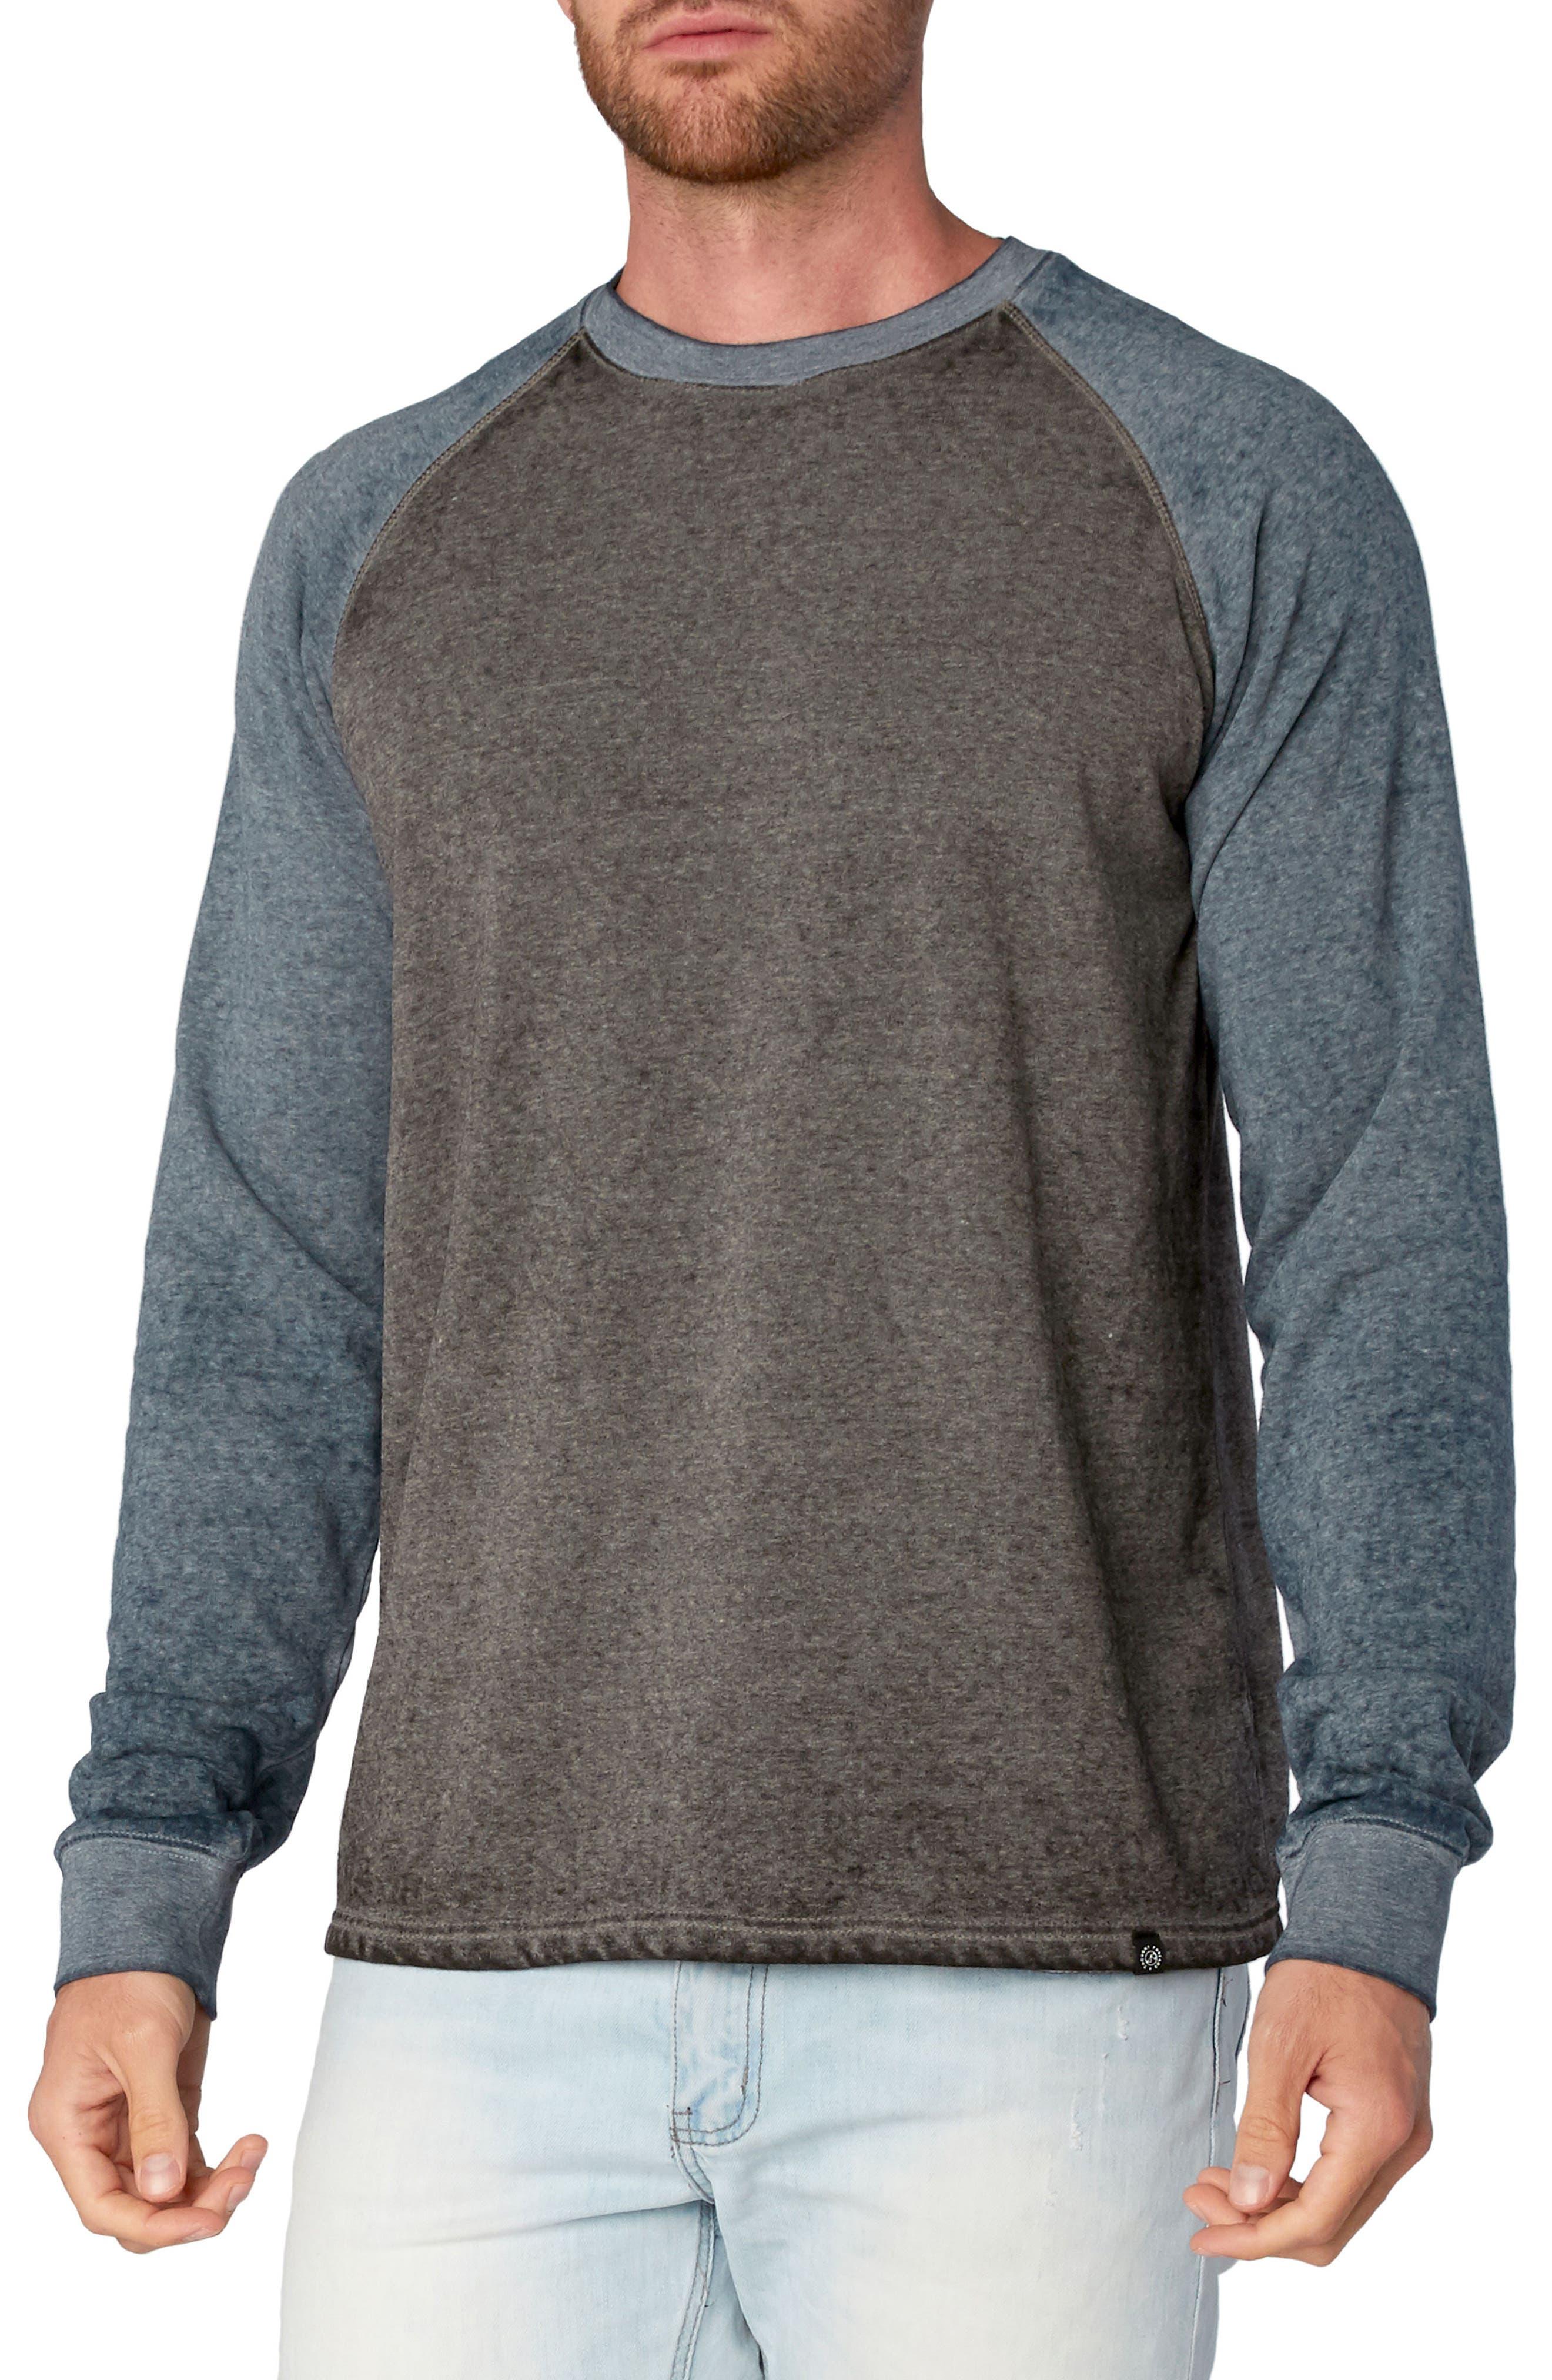 Main Image - Threads for Thought Washed Raglan Sleeve Sweatshirt